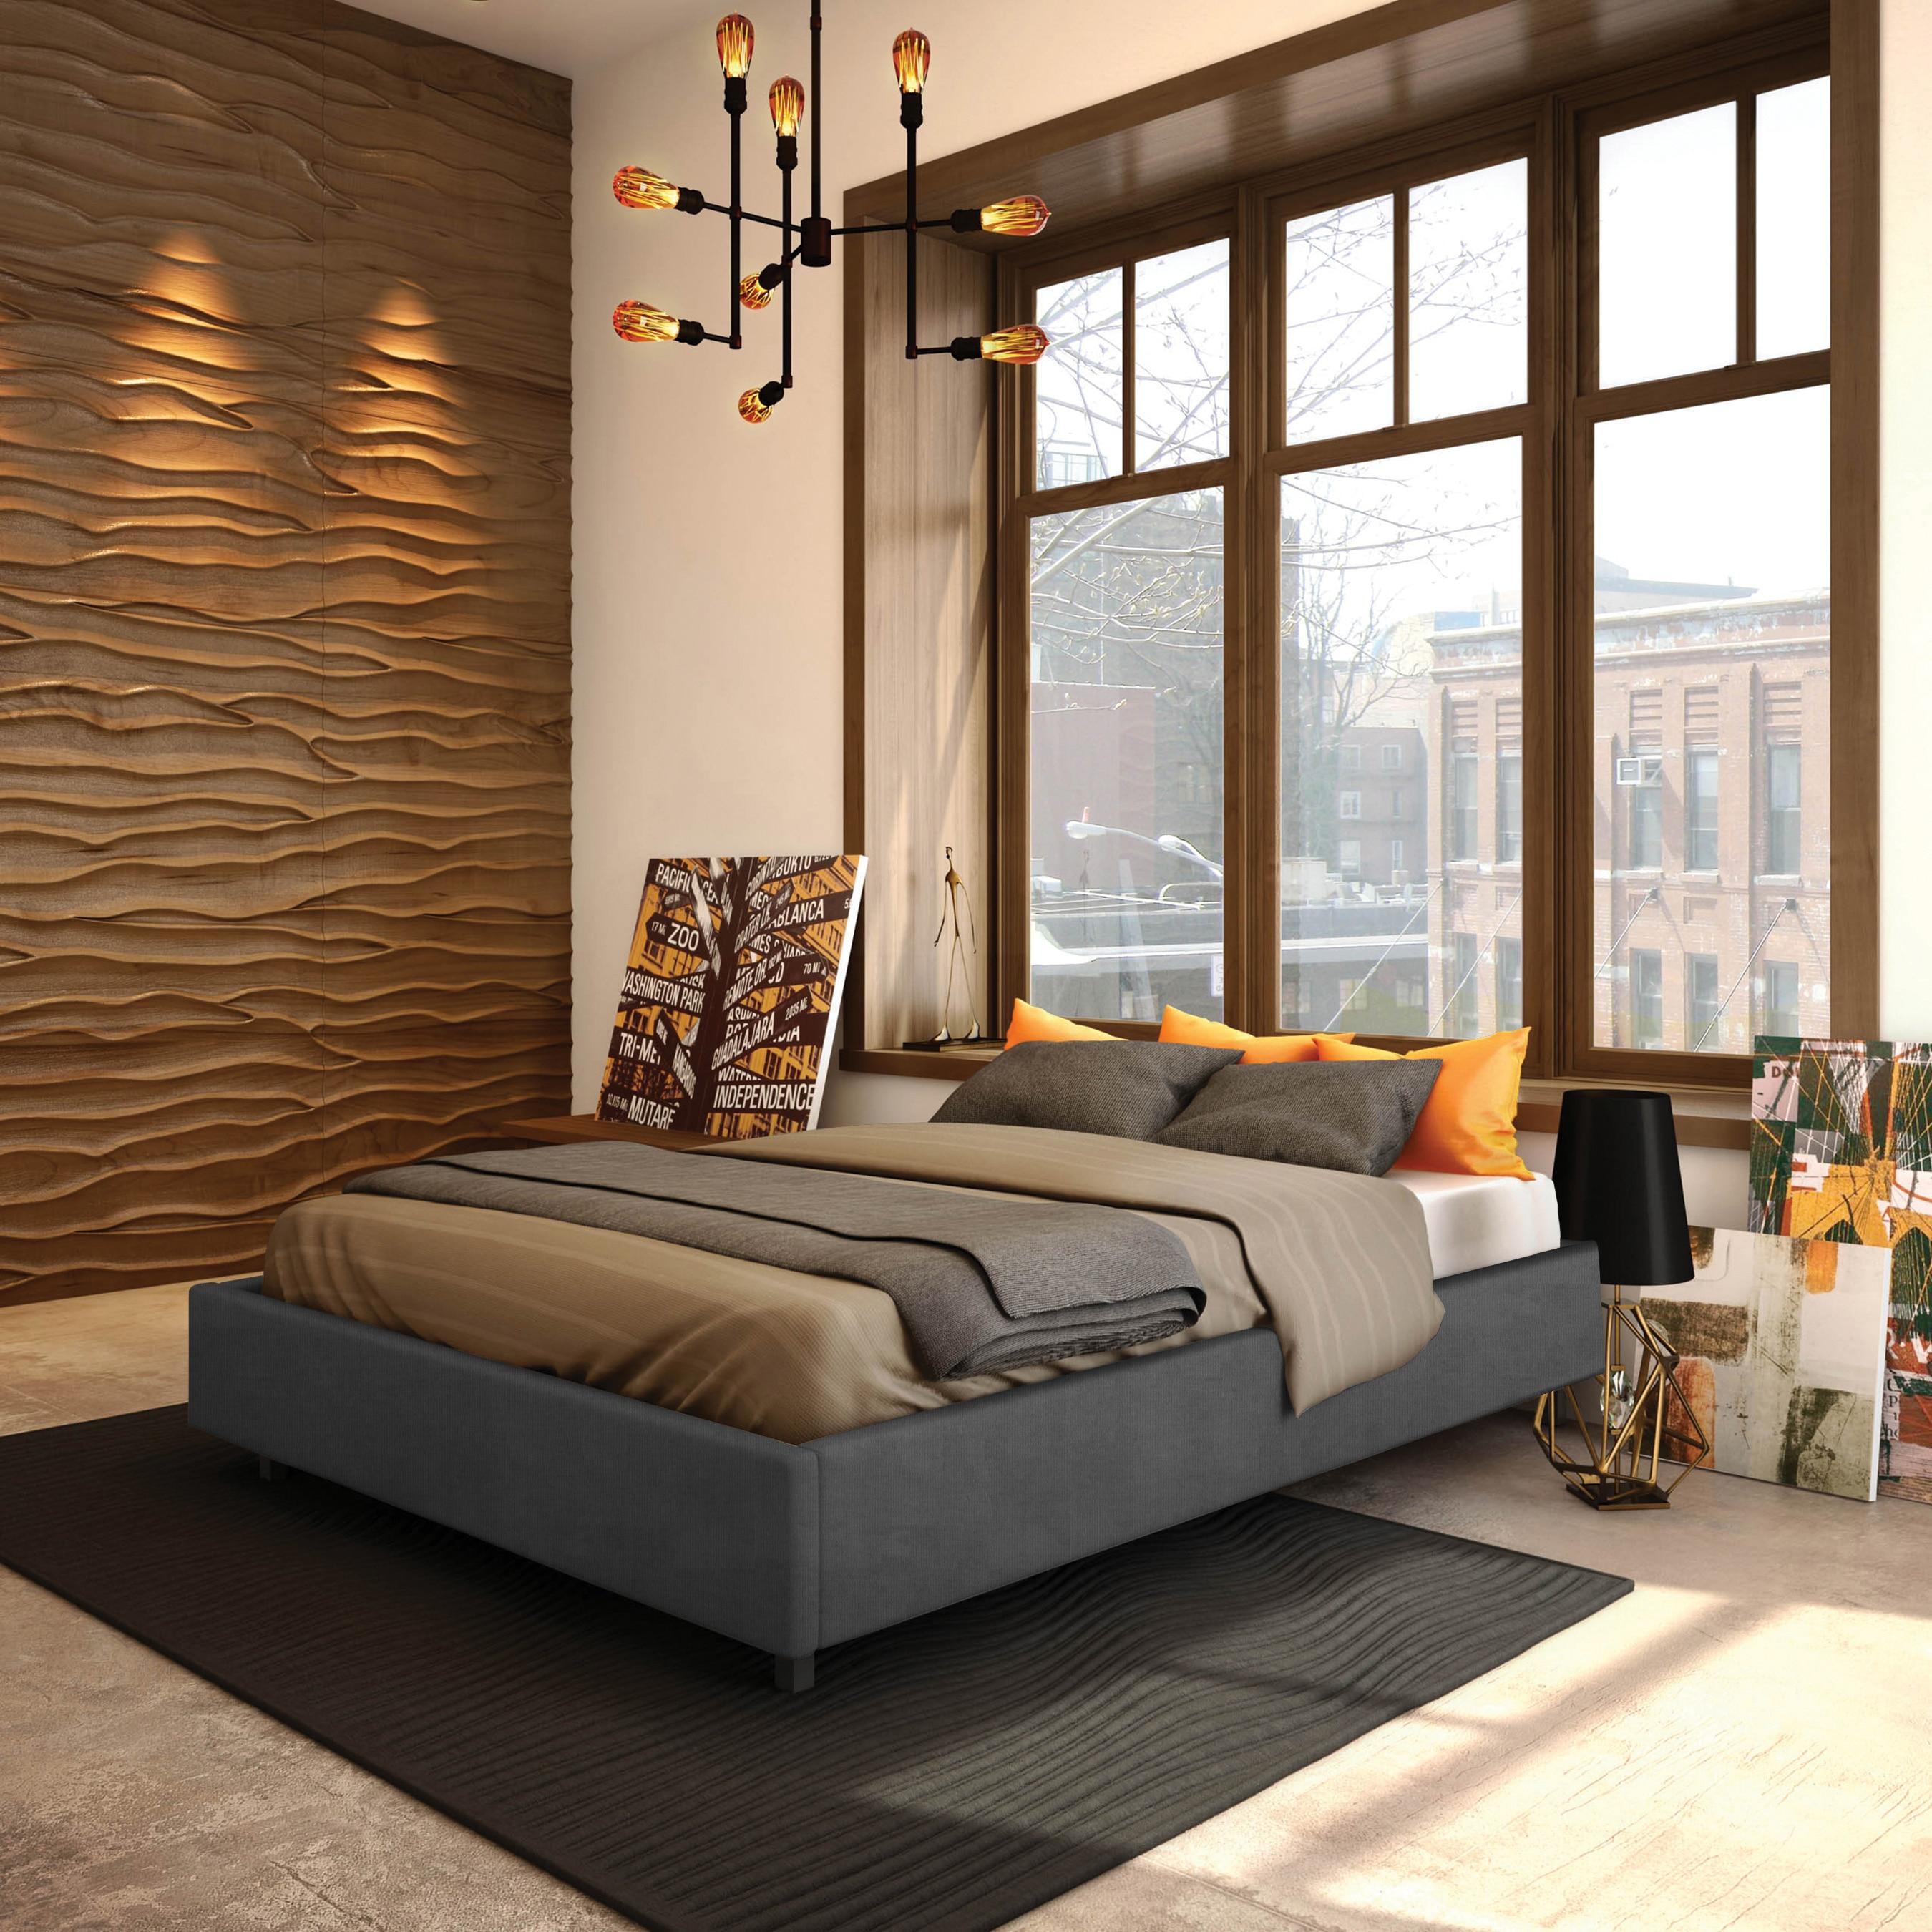 Product 655 514 / Price $249.99   $339.99 , Titus Rosemount Platform Bed  From Titus